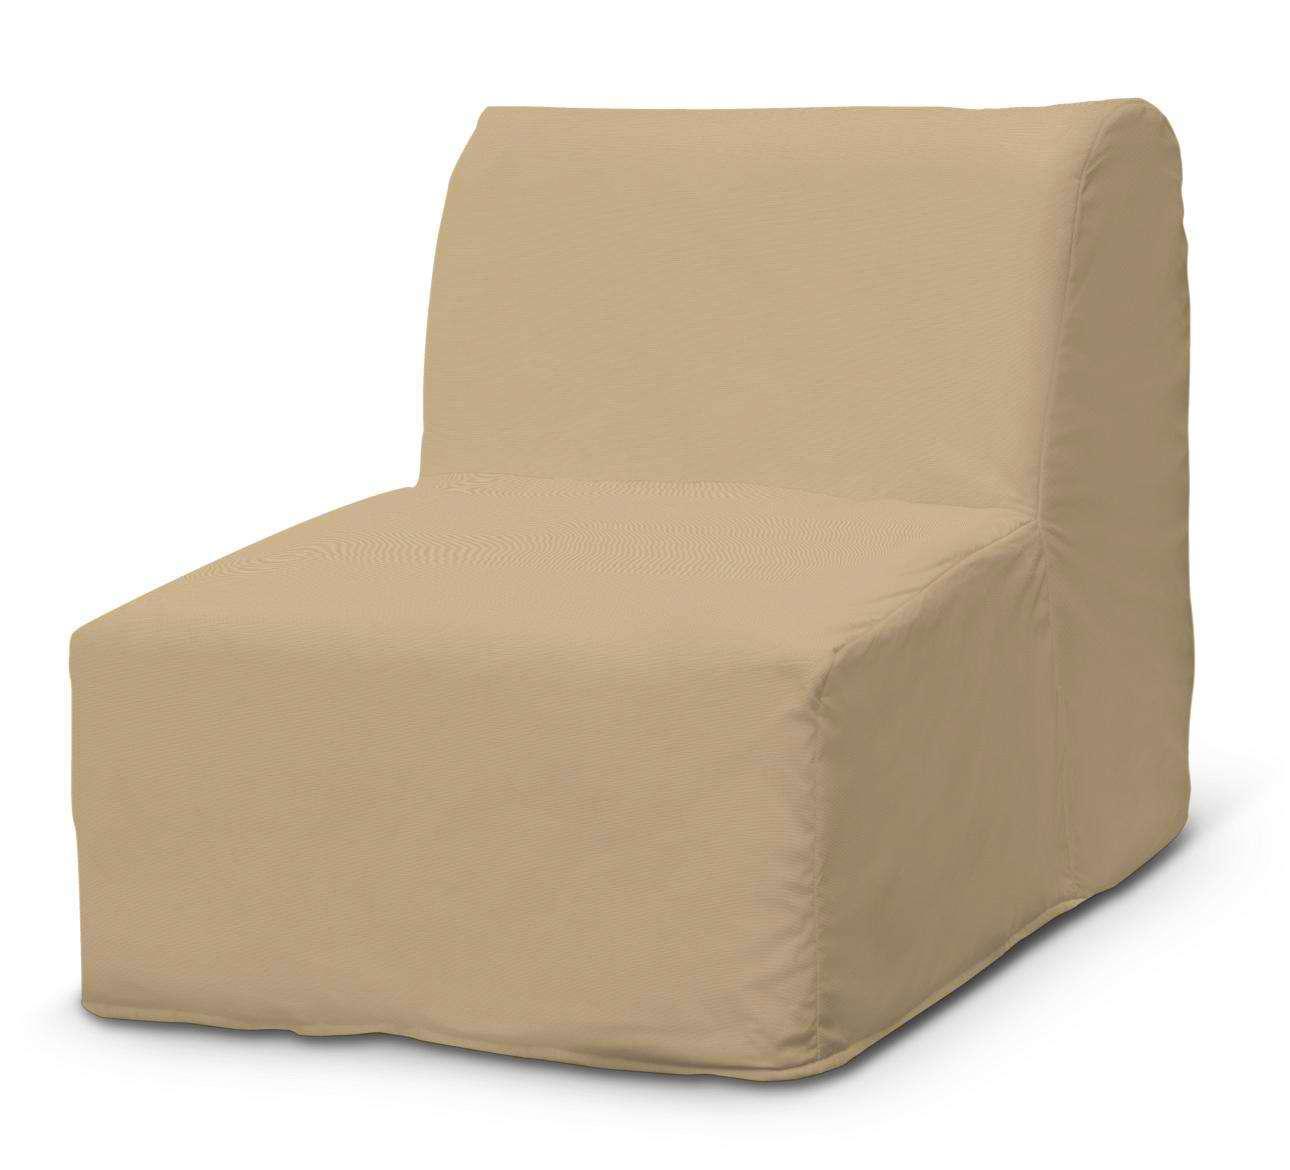 Pokrowiec na fotel Lycksele prosty fotel Lycksele w kolekcji Cotton Panama, tkanina: 702-01